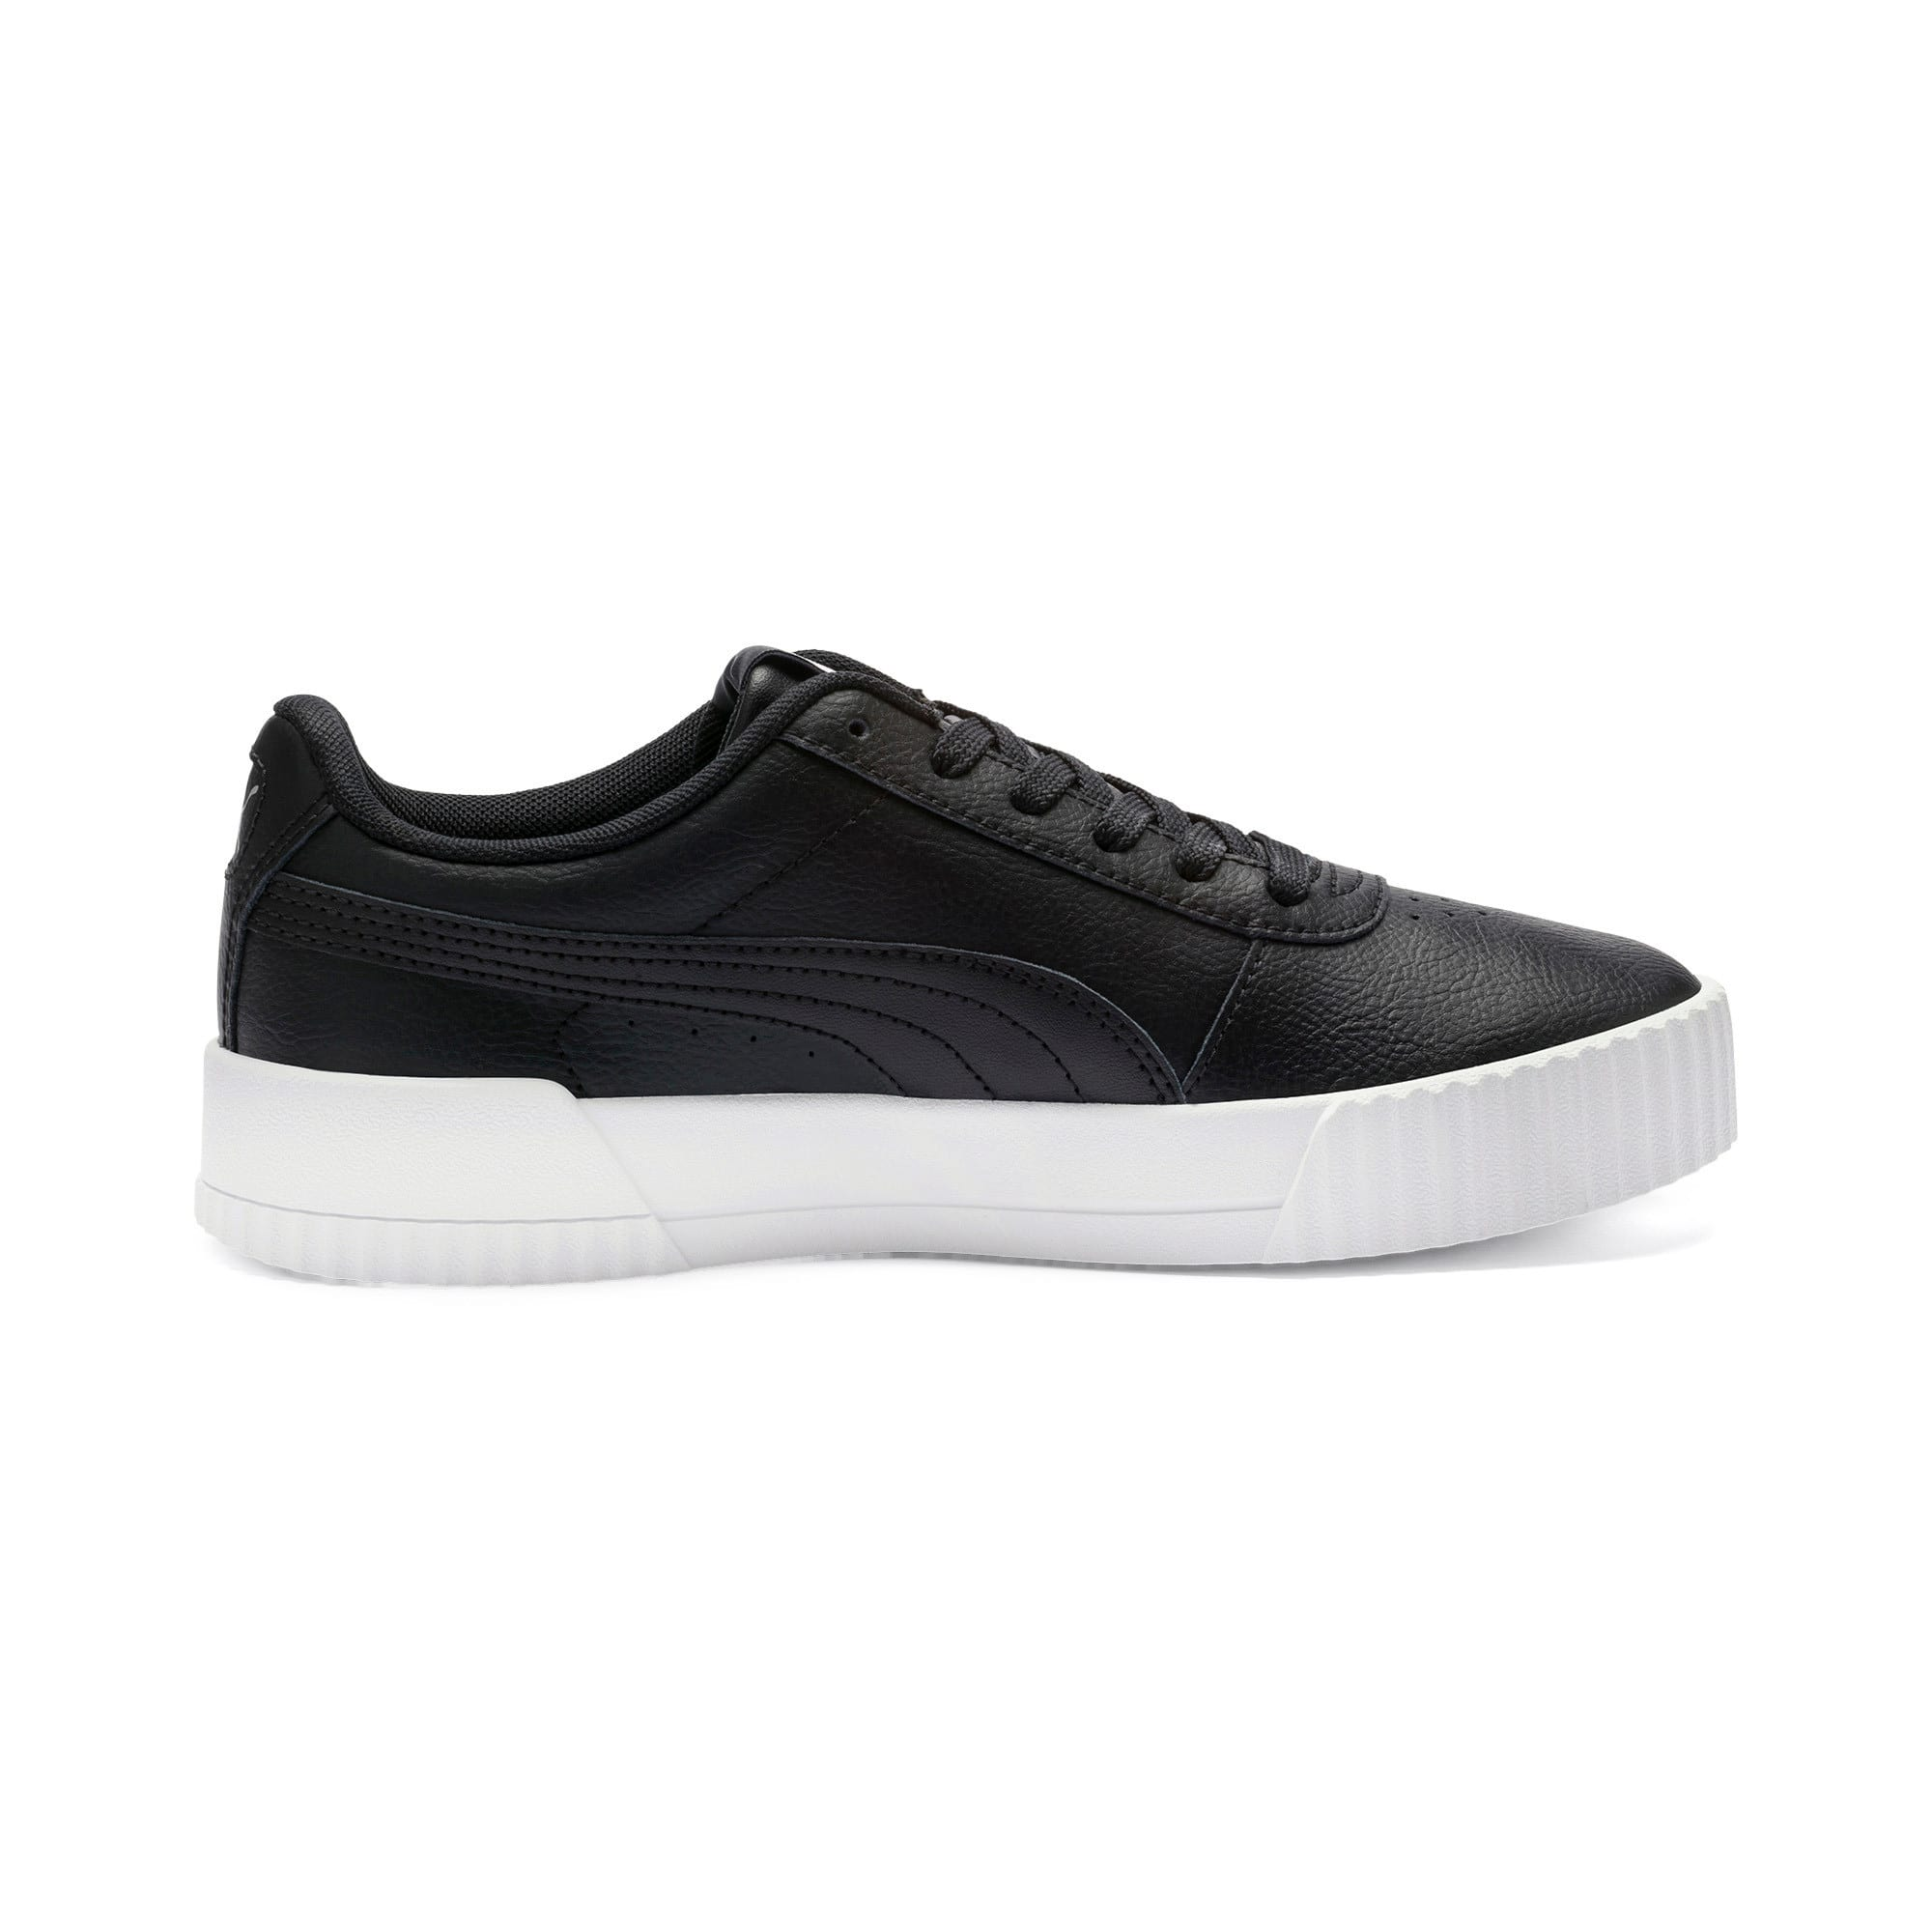 Thumbnail 6 of Carina Leather Women's Sneakers, Puma Black- White-Silver, medium